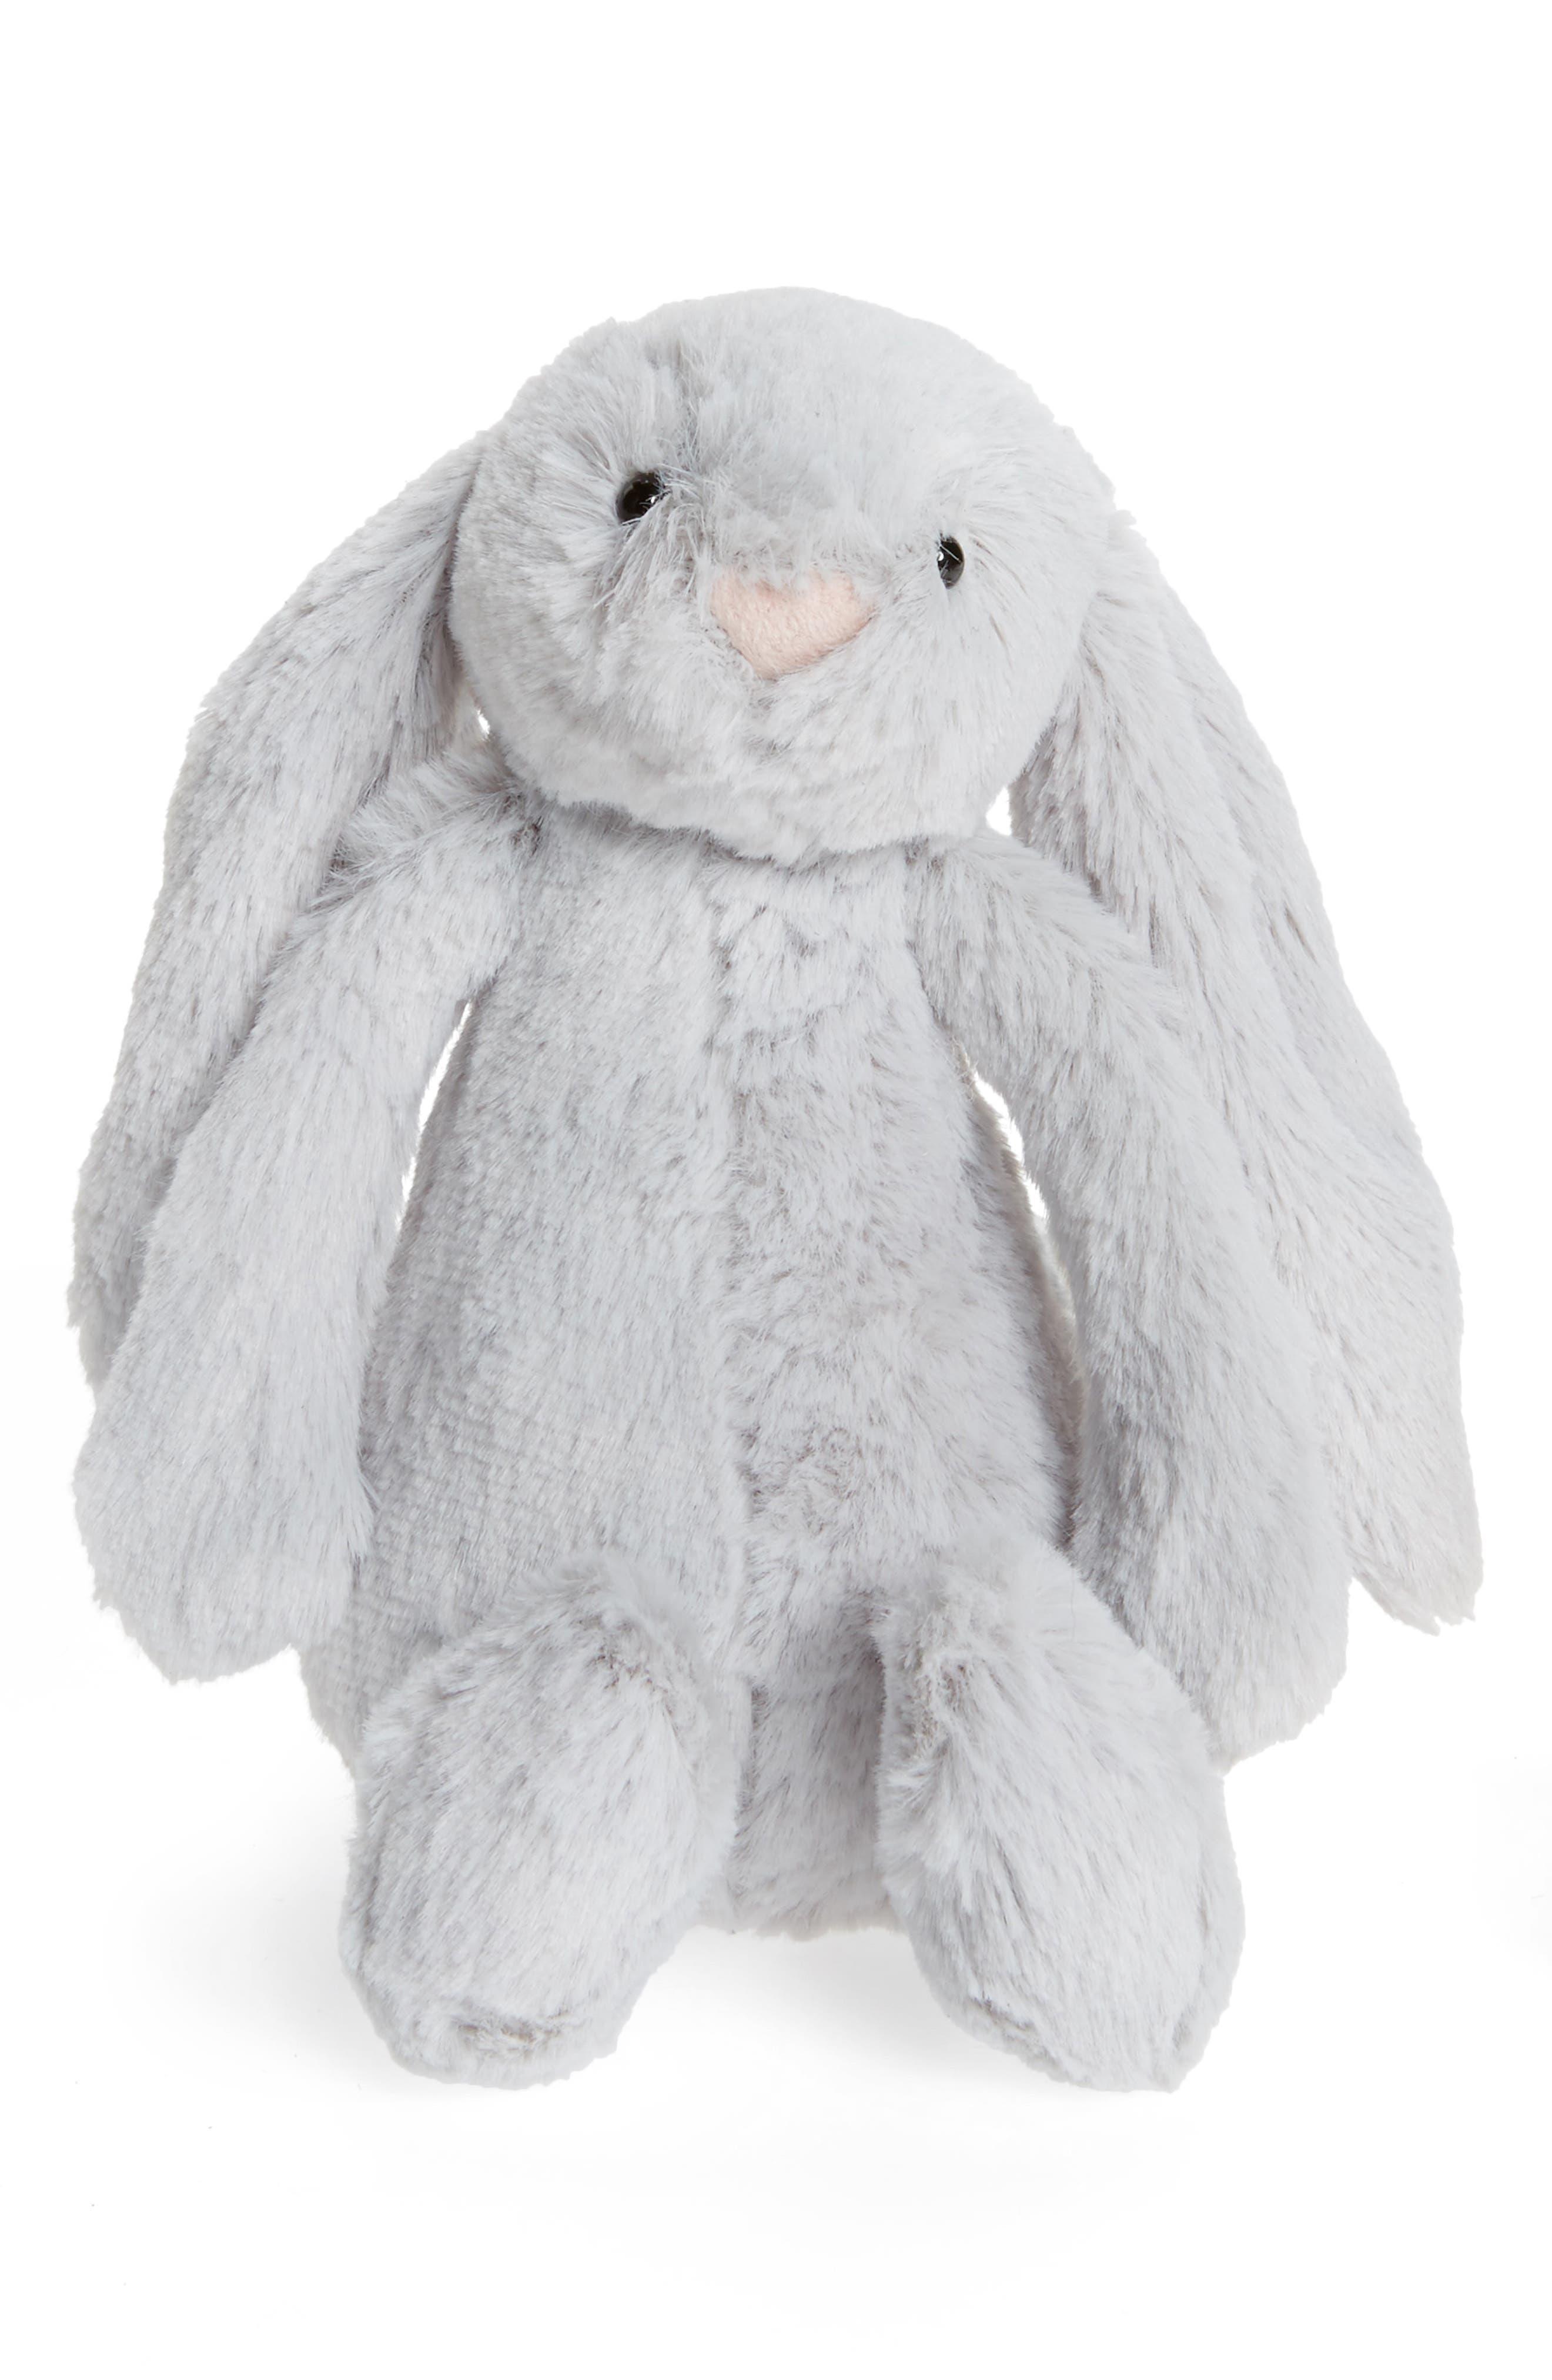 JELLYCAT 'Small Bashful Bunny' Stuffed Animal, Main, color, GREY